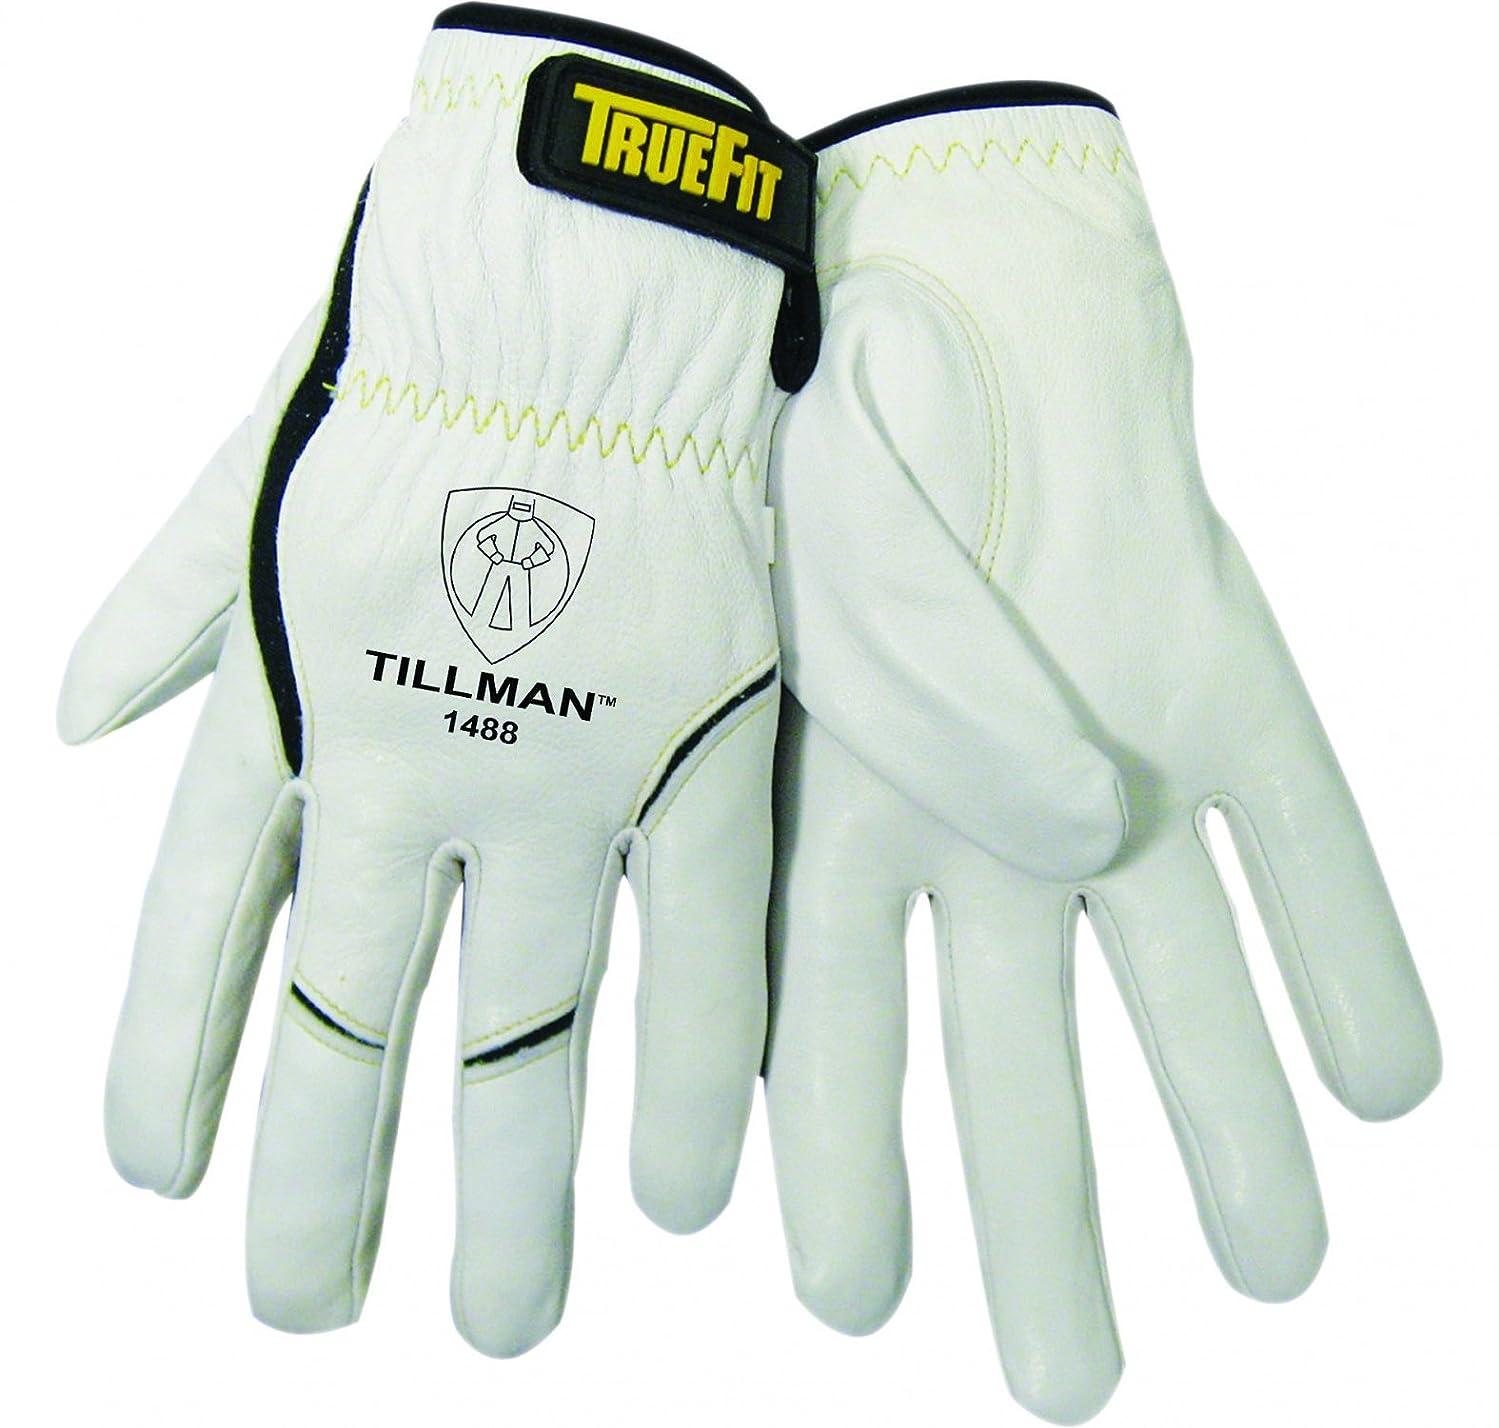 John Tillman 1488 XL True Fit X-Large Top Grain Kevlar/Goatskin Super Premium Grade TIG Welders' Glove, Elastic Cuff, V Design Thumb/Hook/Loop Closure, English, 30.68 fl. oz, Plastic, 1 x 11.2 x 4.4